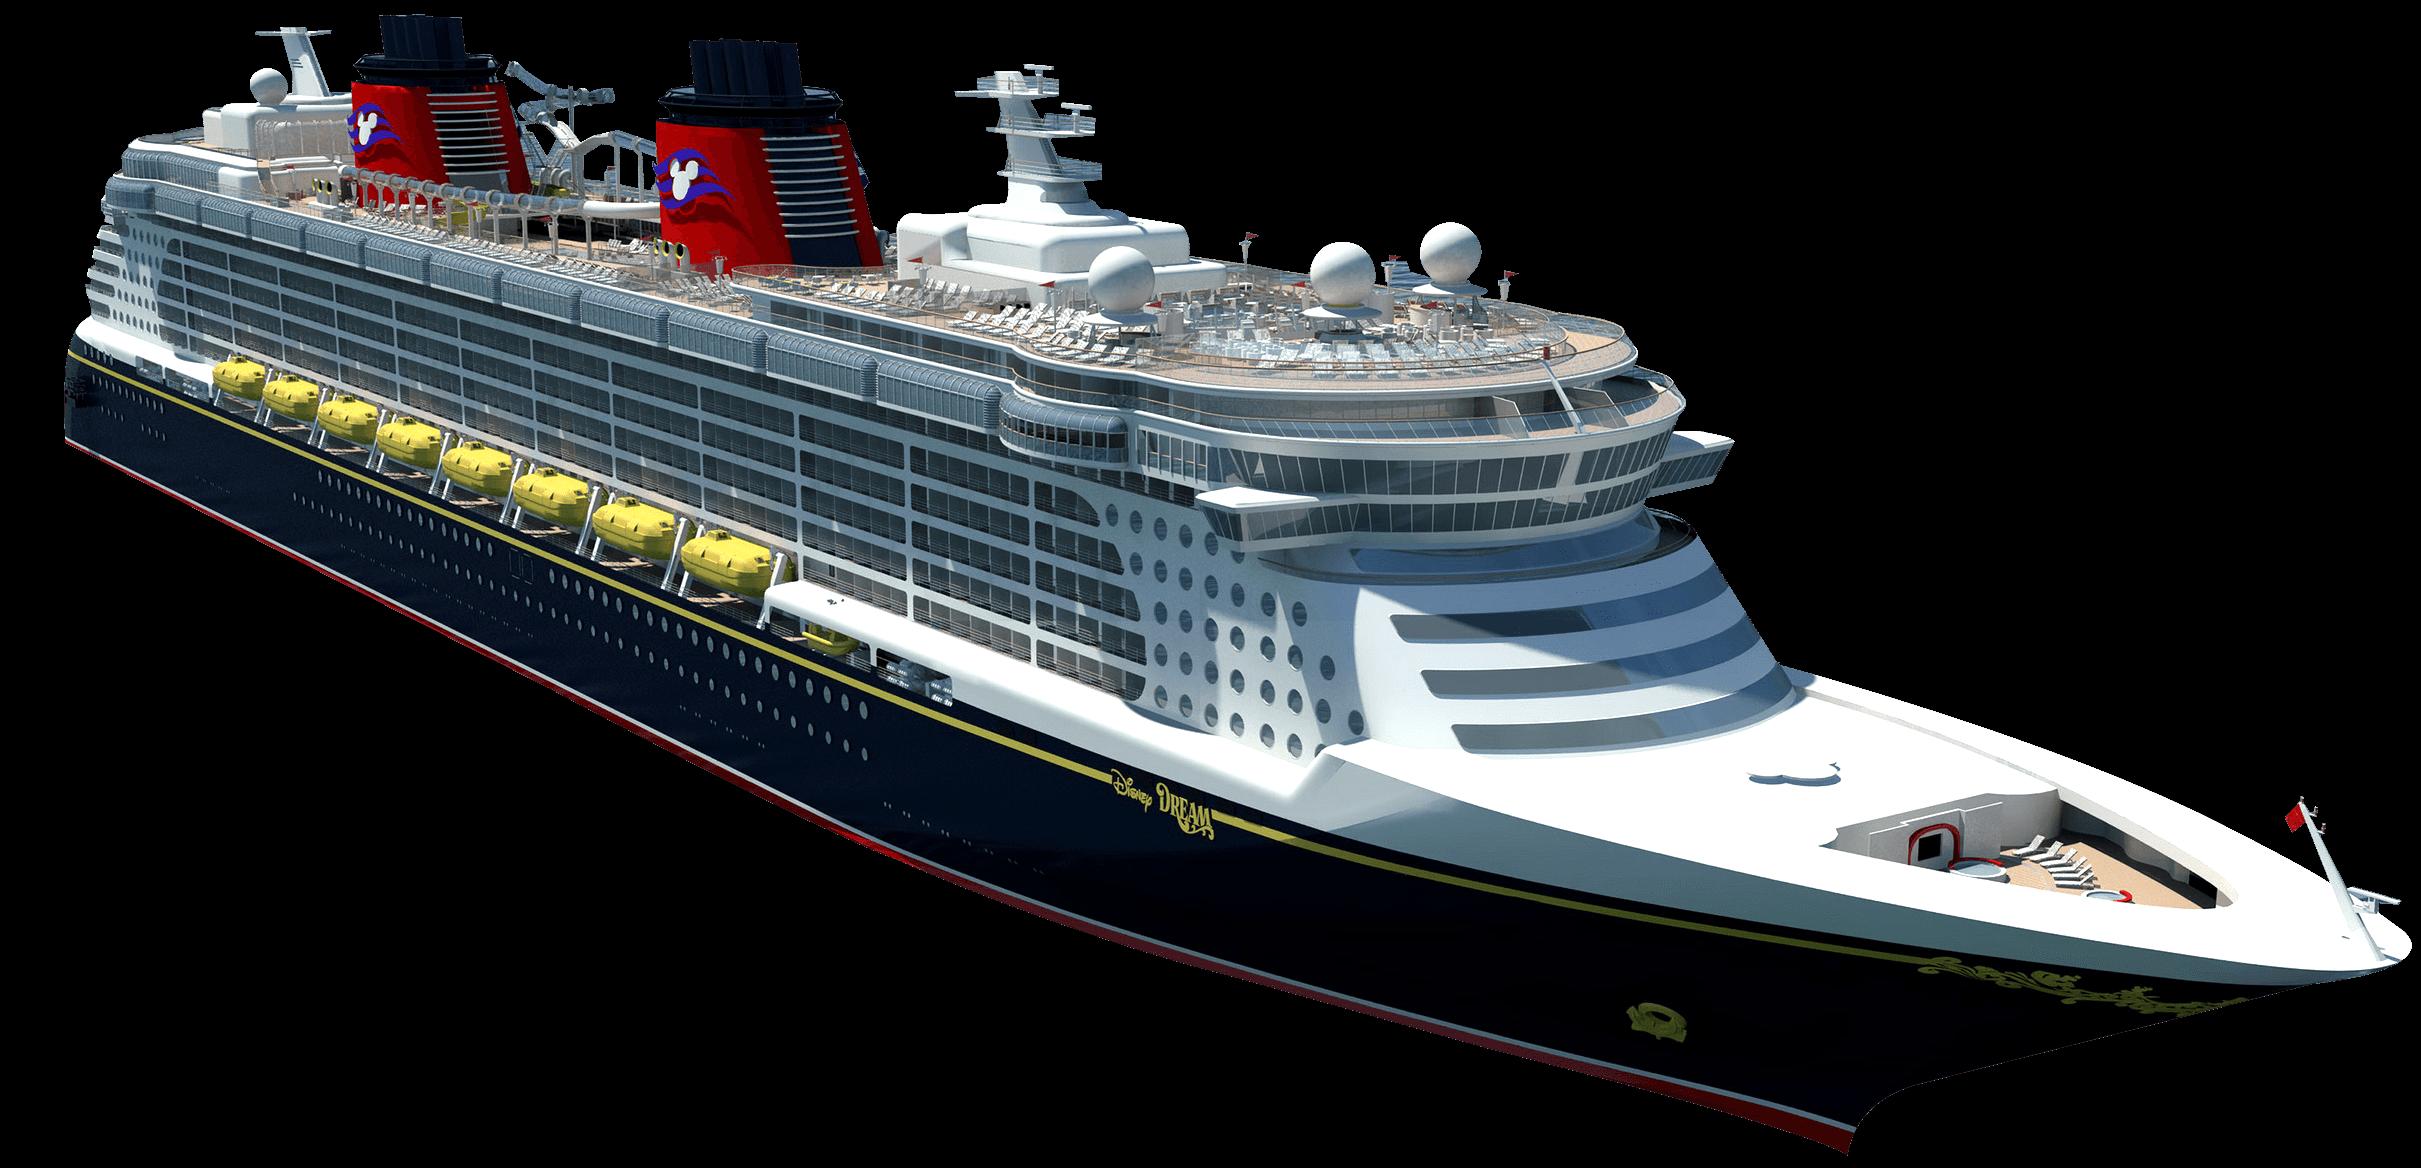 Cruise Ship Illustration transparent PNG.